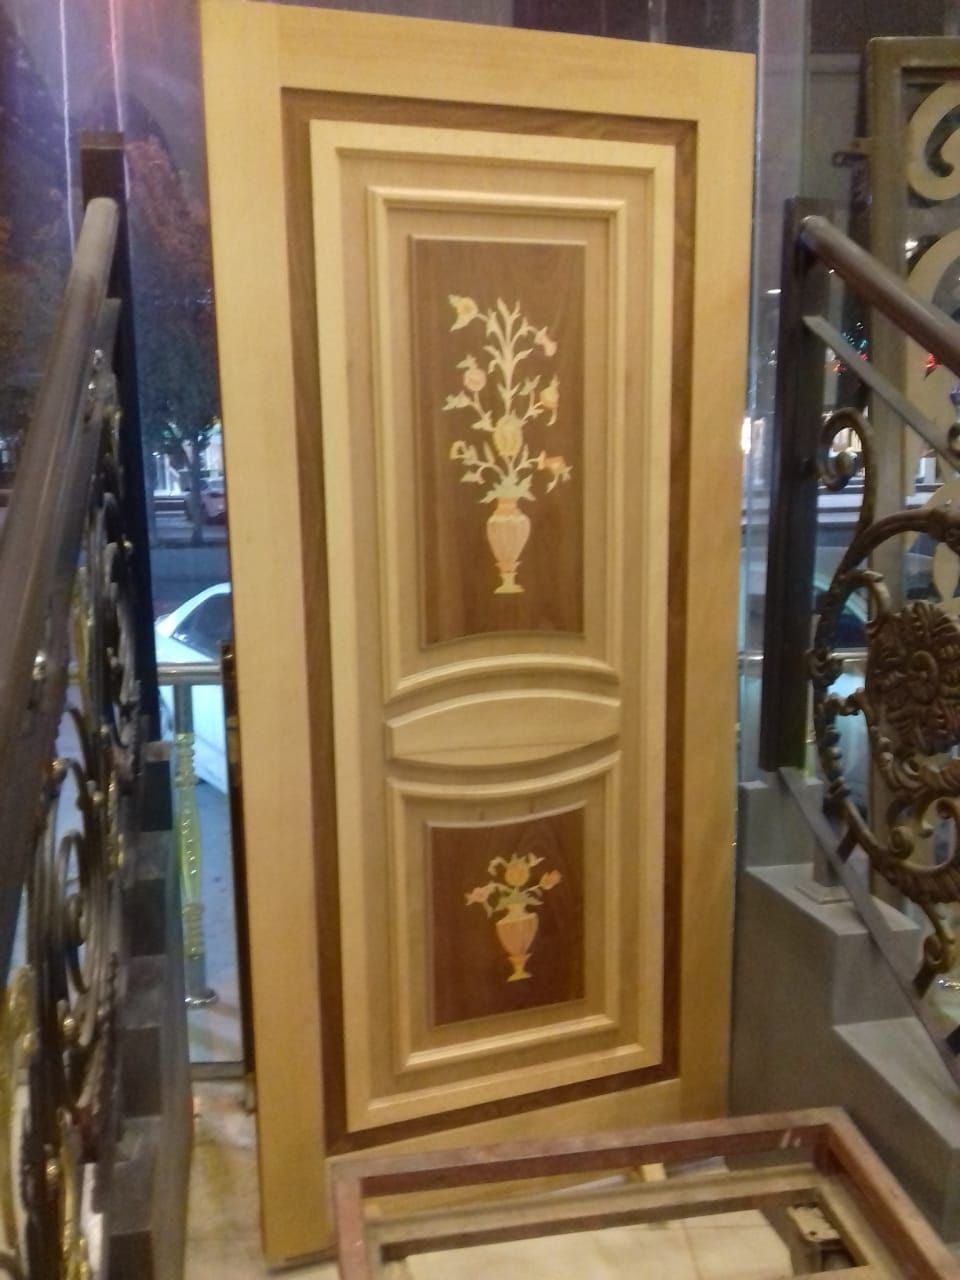 Pin By Sari Sami On مقاولات عامة الرياض 0530608113 Home Decor Decor Furniture